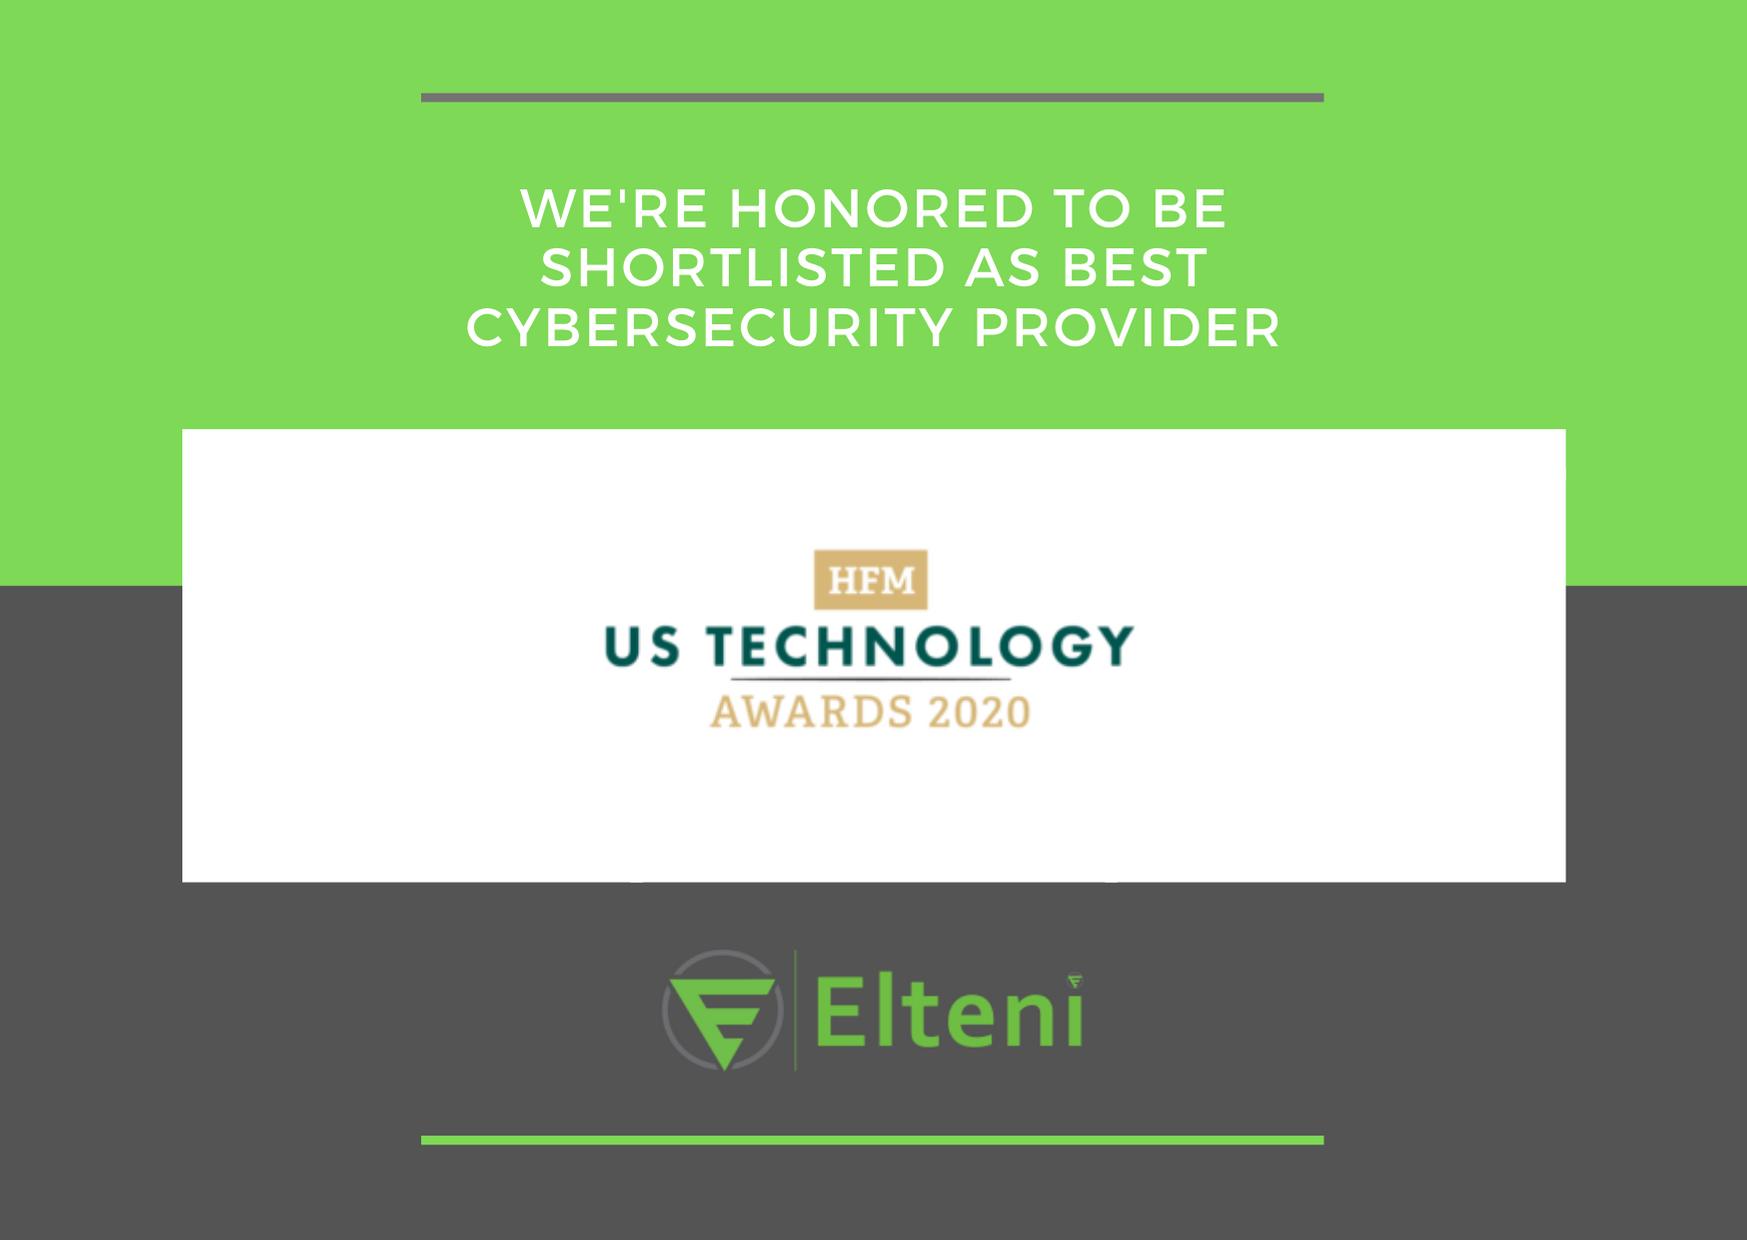 HFM US 2020 Awards - Elteni (Hedge Fund Service Provider Award)